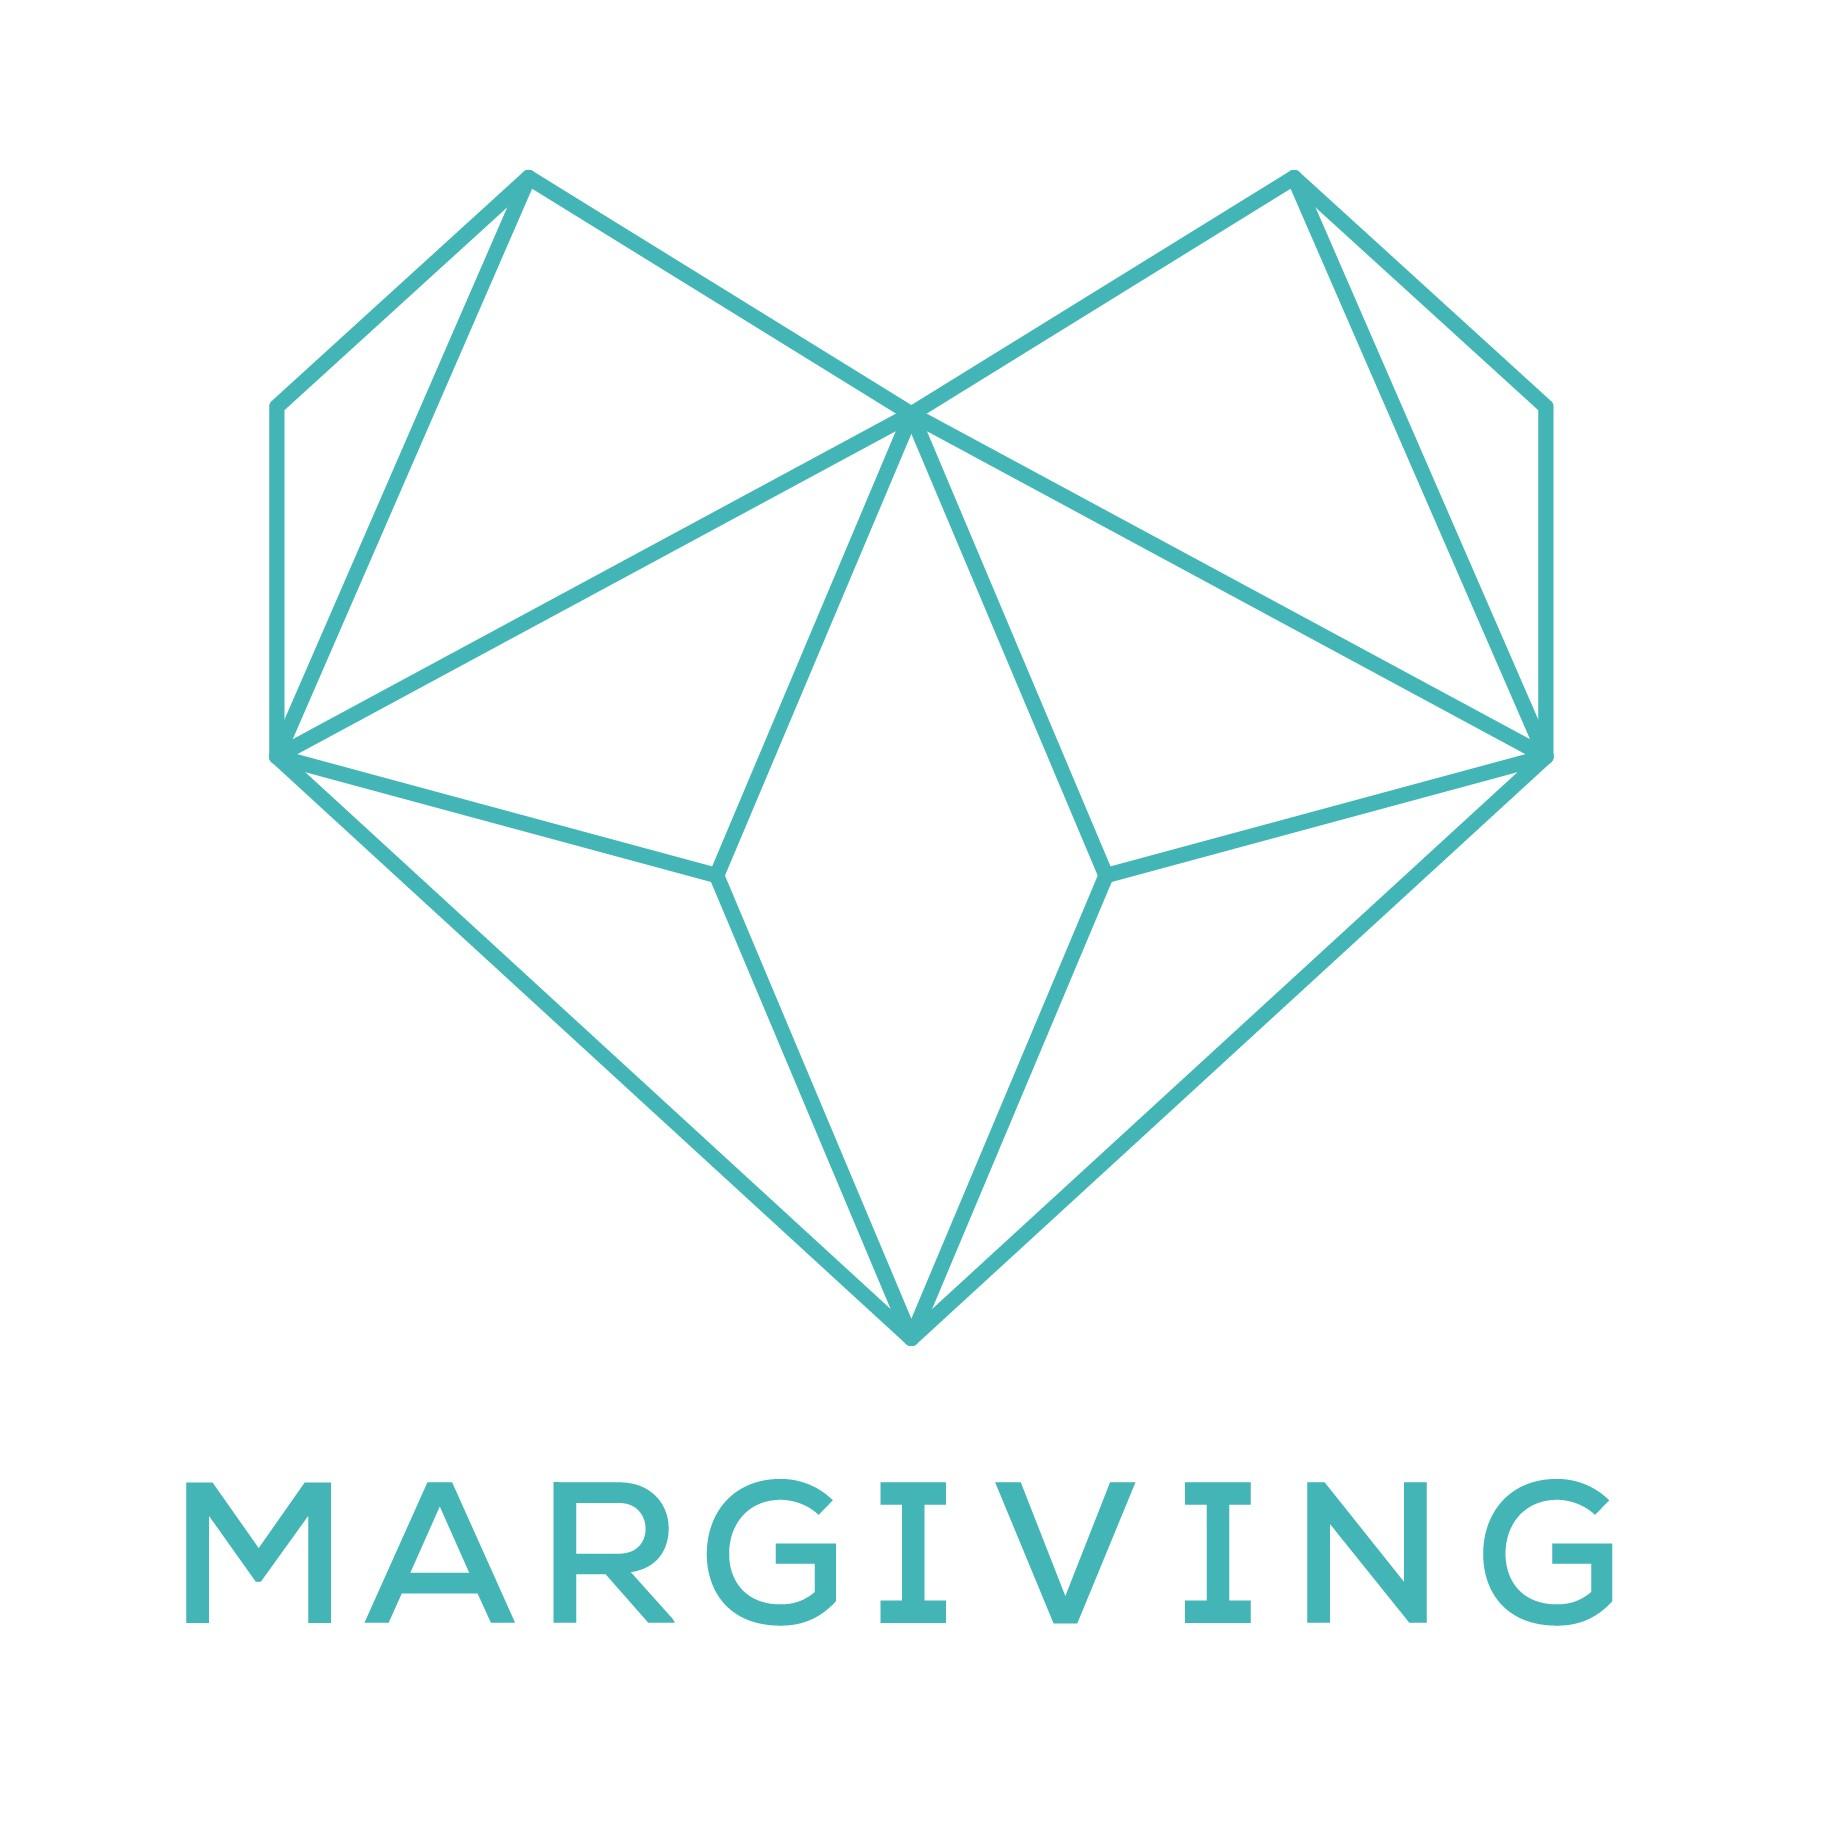 Margiving